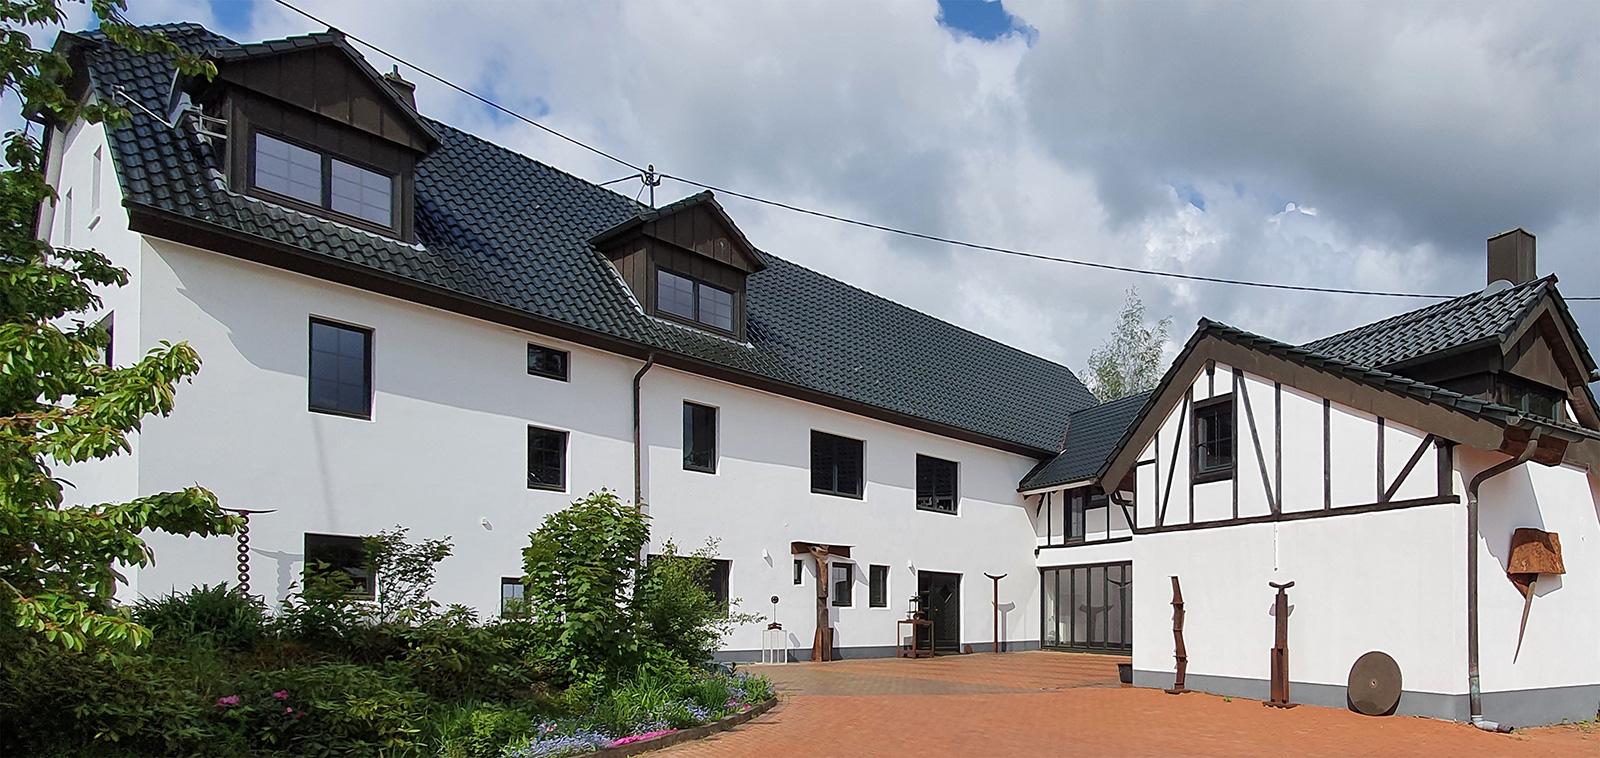 Villa Arte I Gesamtansicht